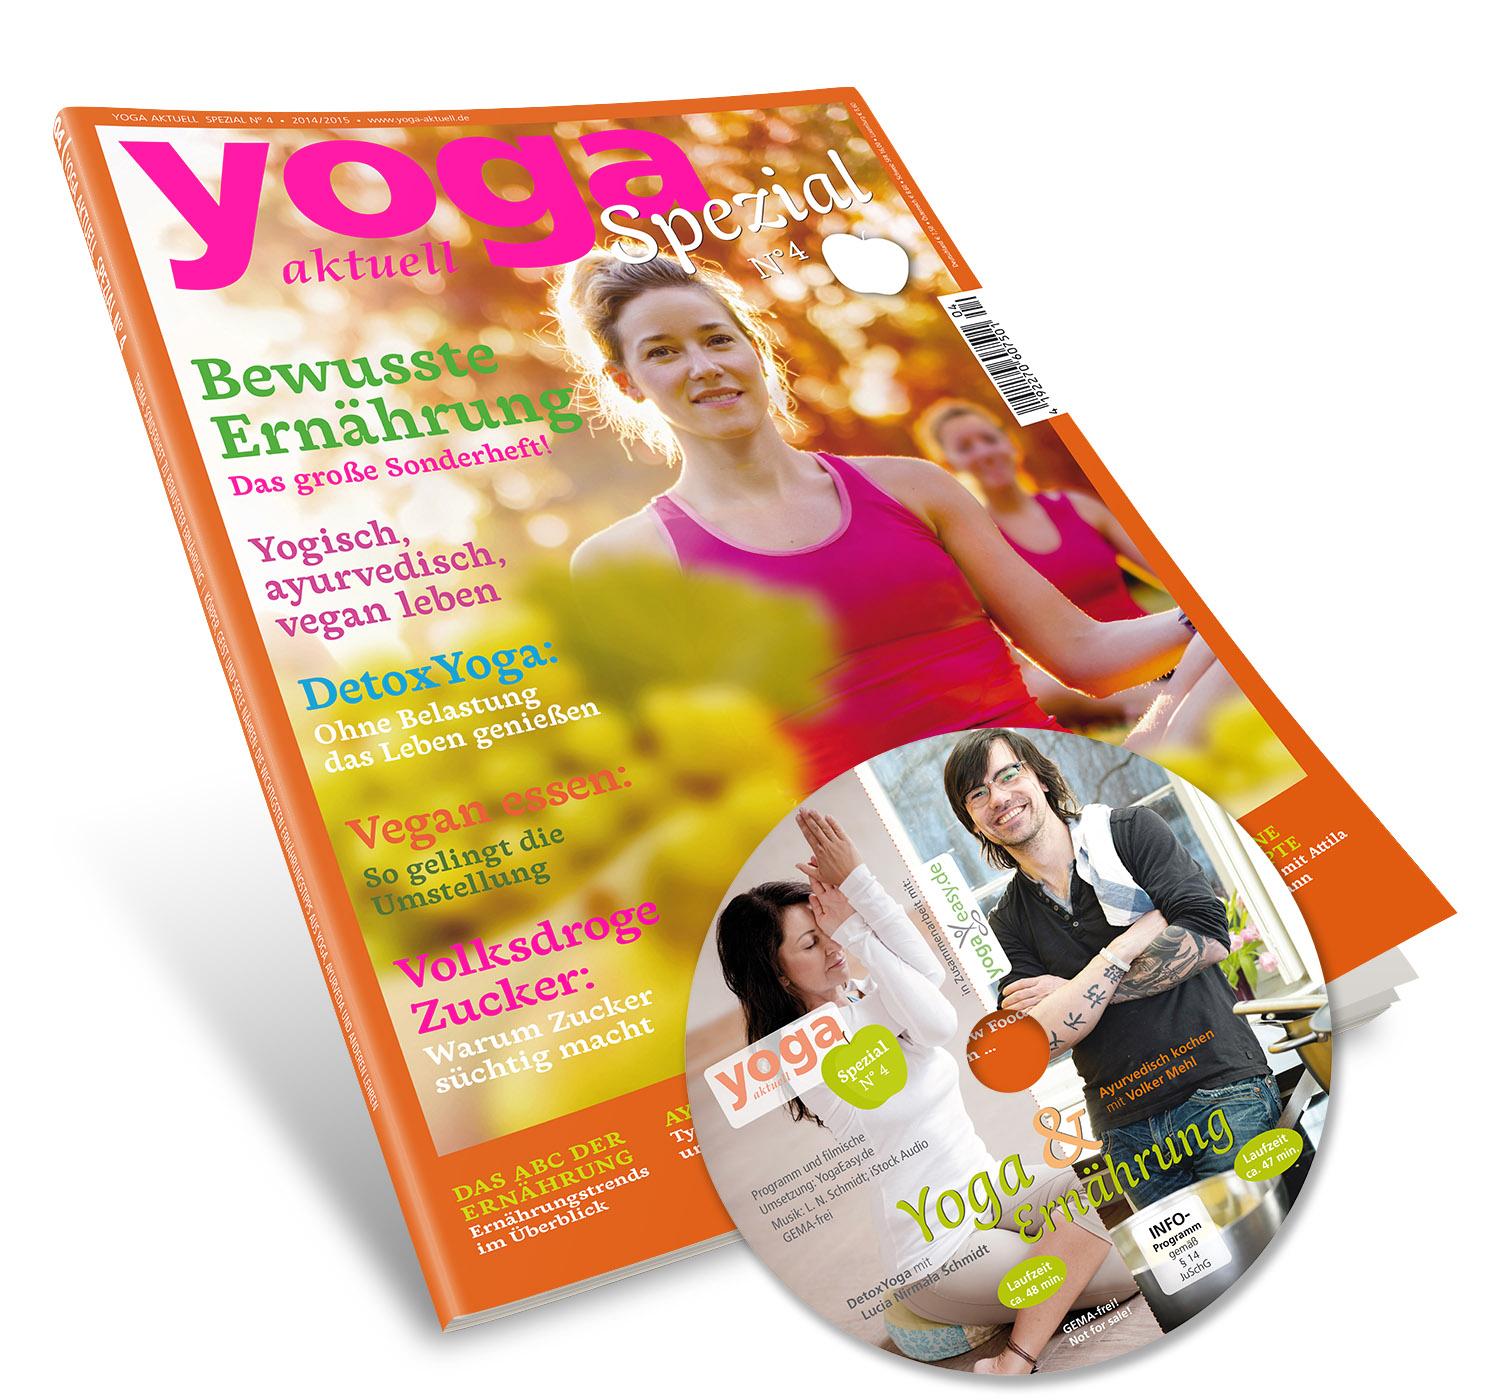 Yoga Aktuell Spezial Nr. 4 - Bewusste Ernährung